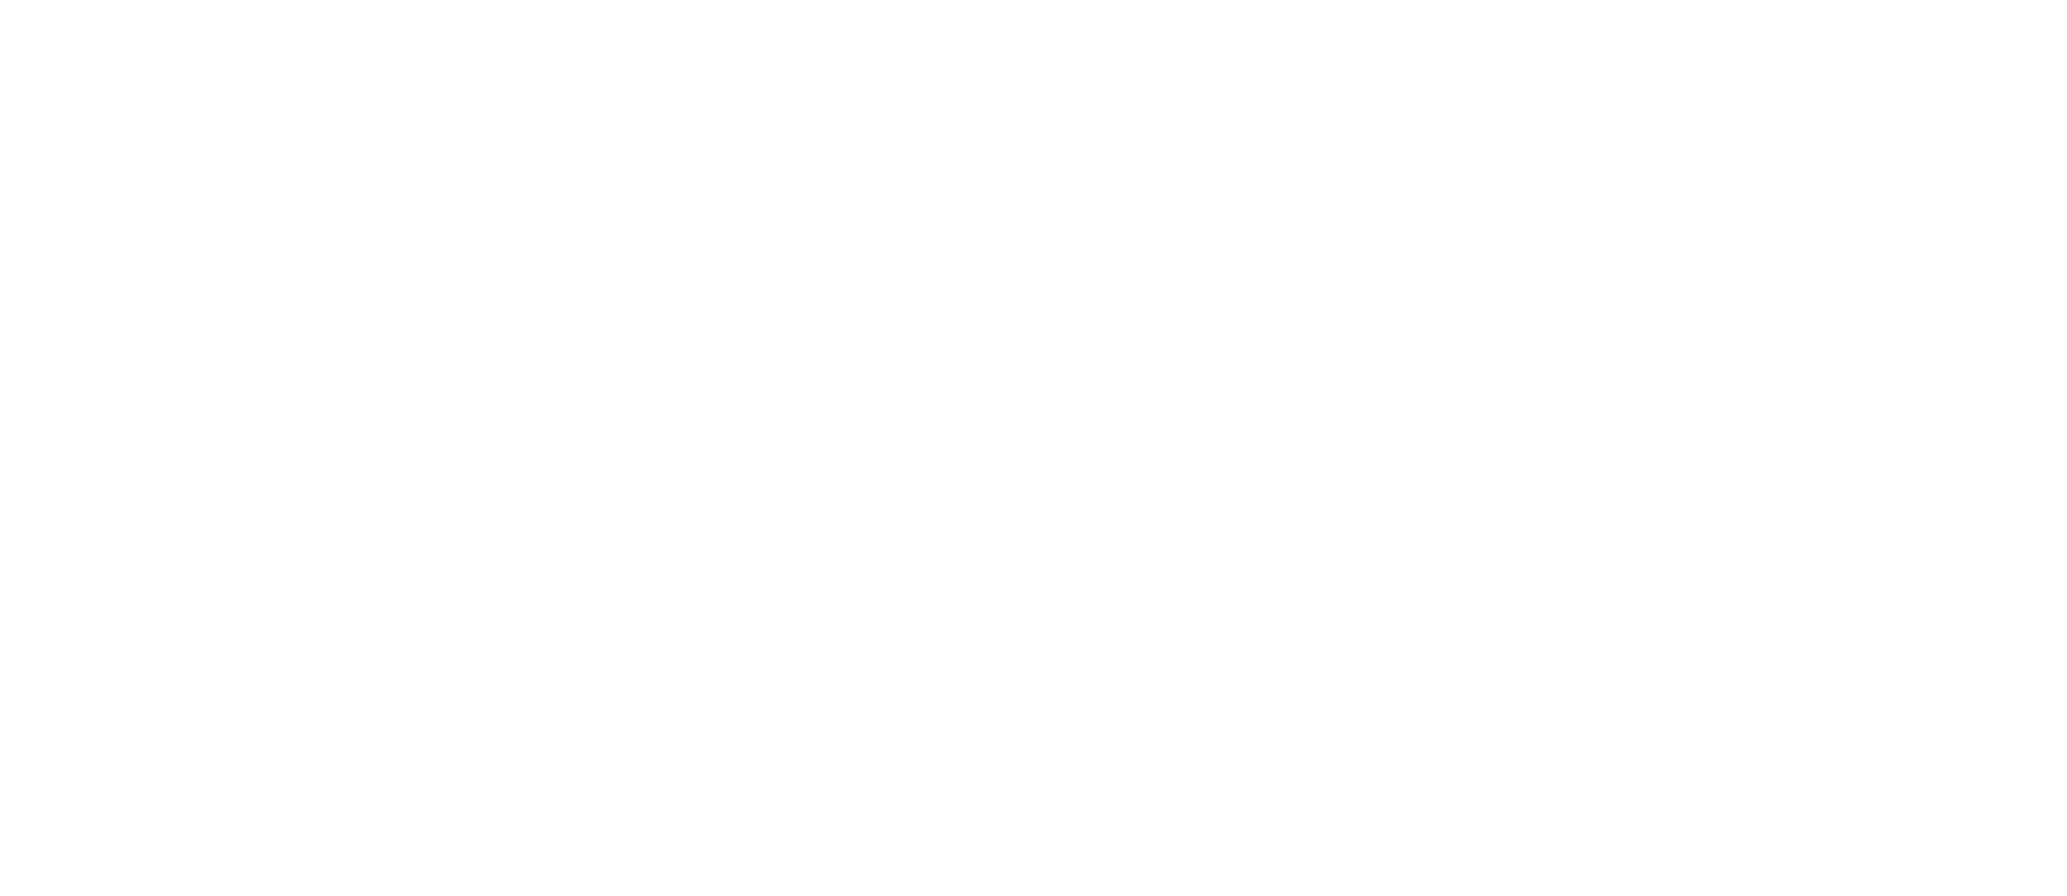 Workday logo white